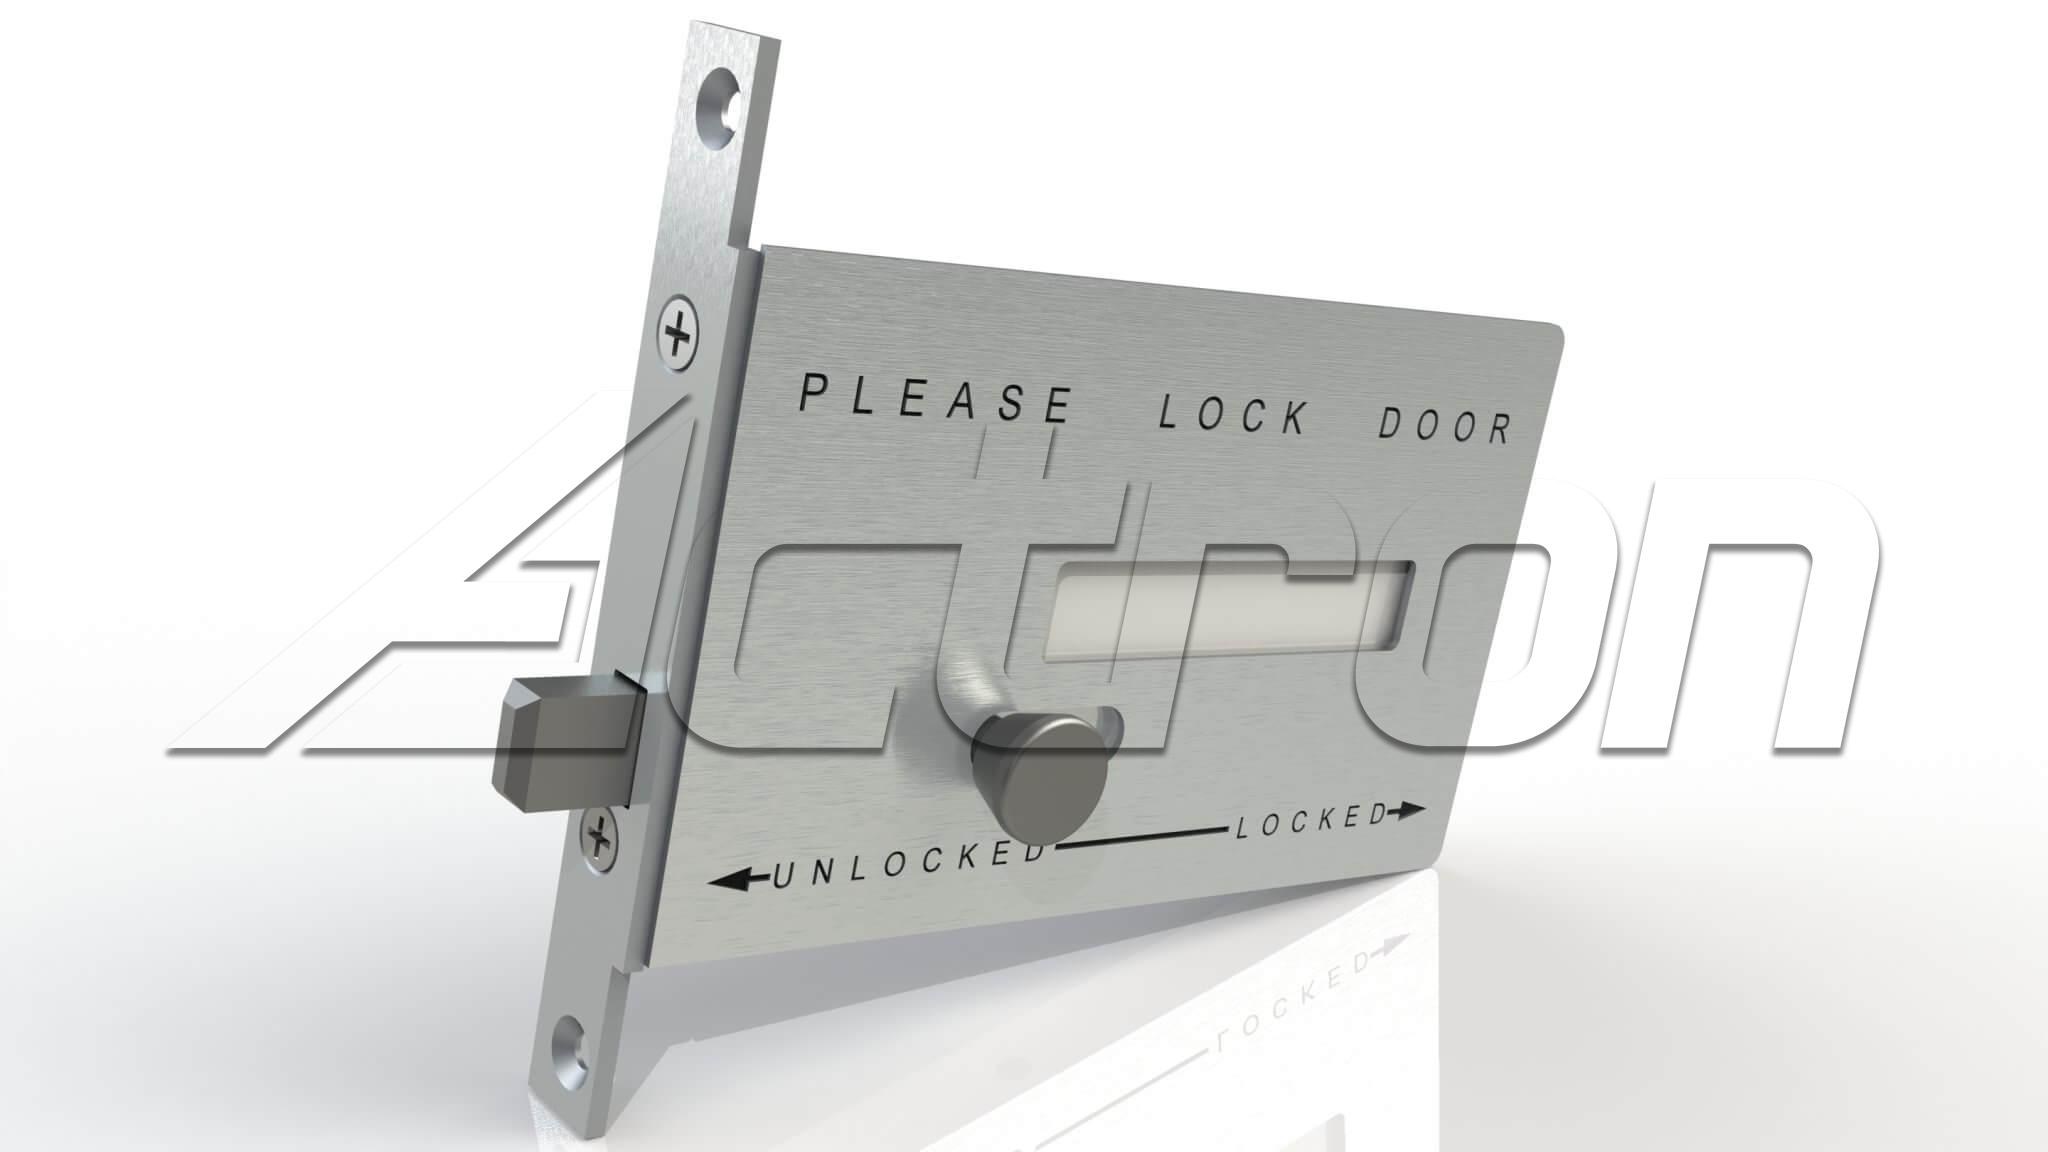 latch-assy-8211-lavatory-4953-a41024.jpg